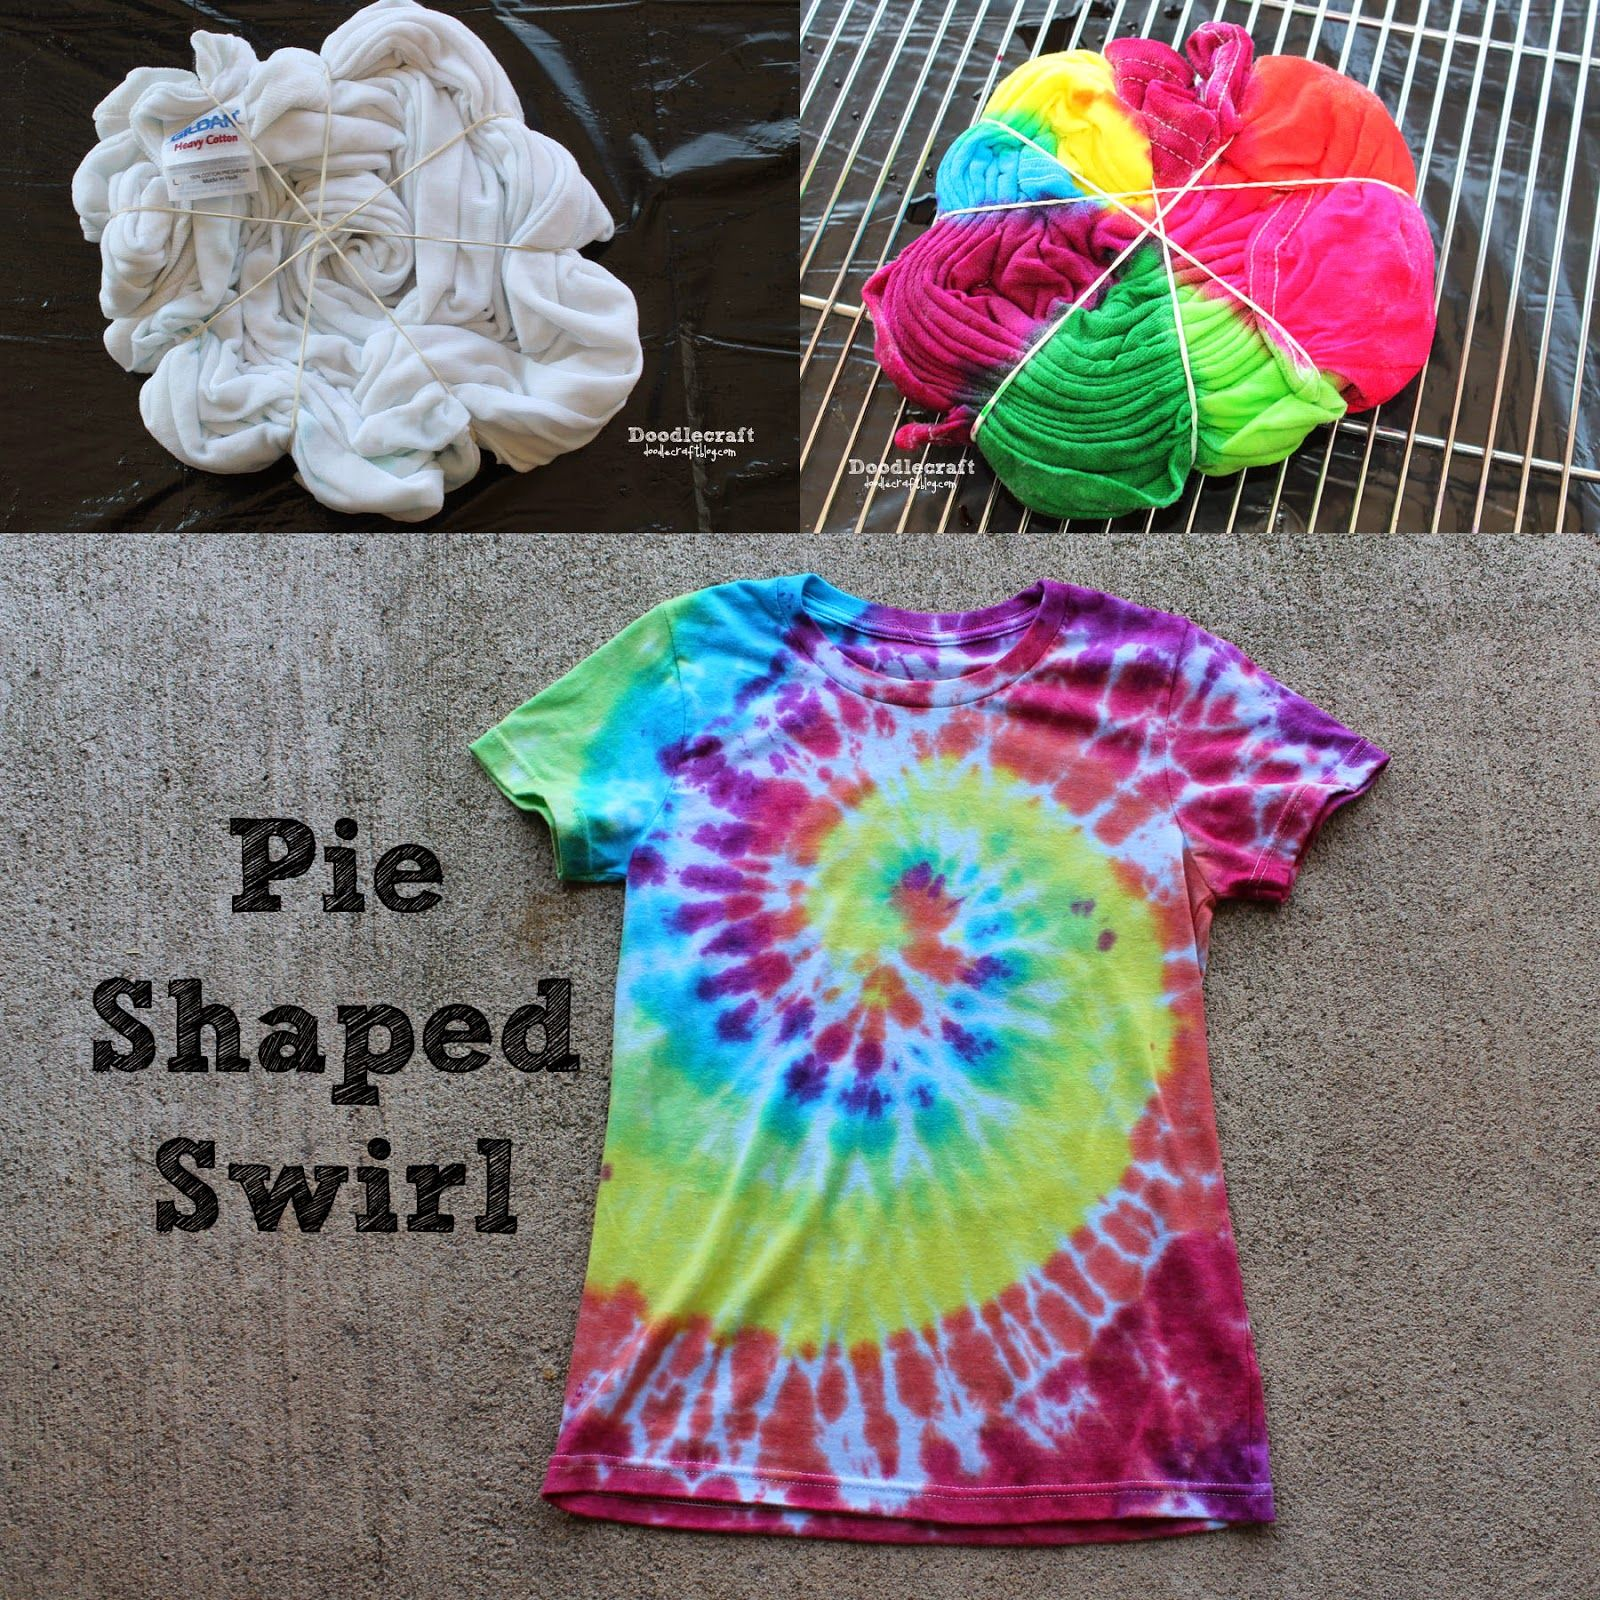 How To Host A Tie Dye T Shirt Party Tie Dye Crafts Diy Tie Dye Shirts Tulip Tie Dye [ 1600 x 1600 Pixel ]